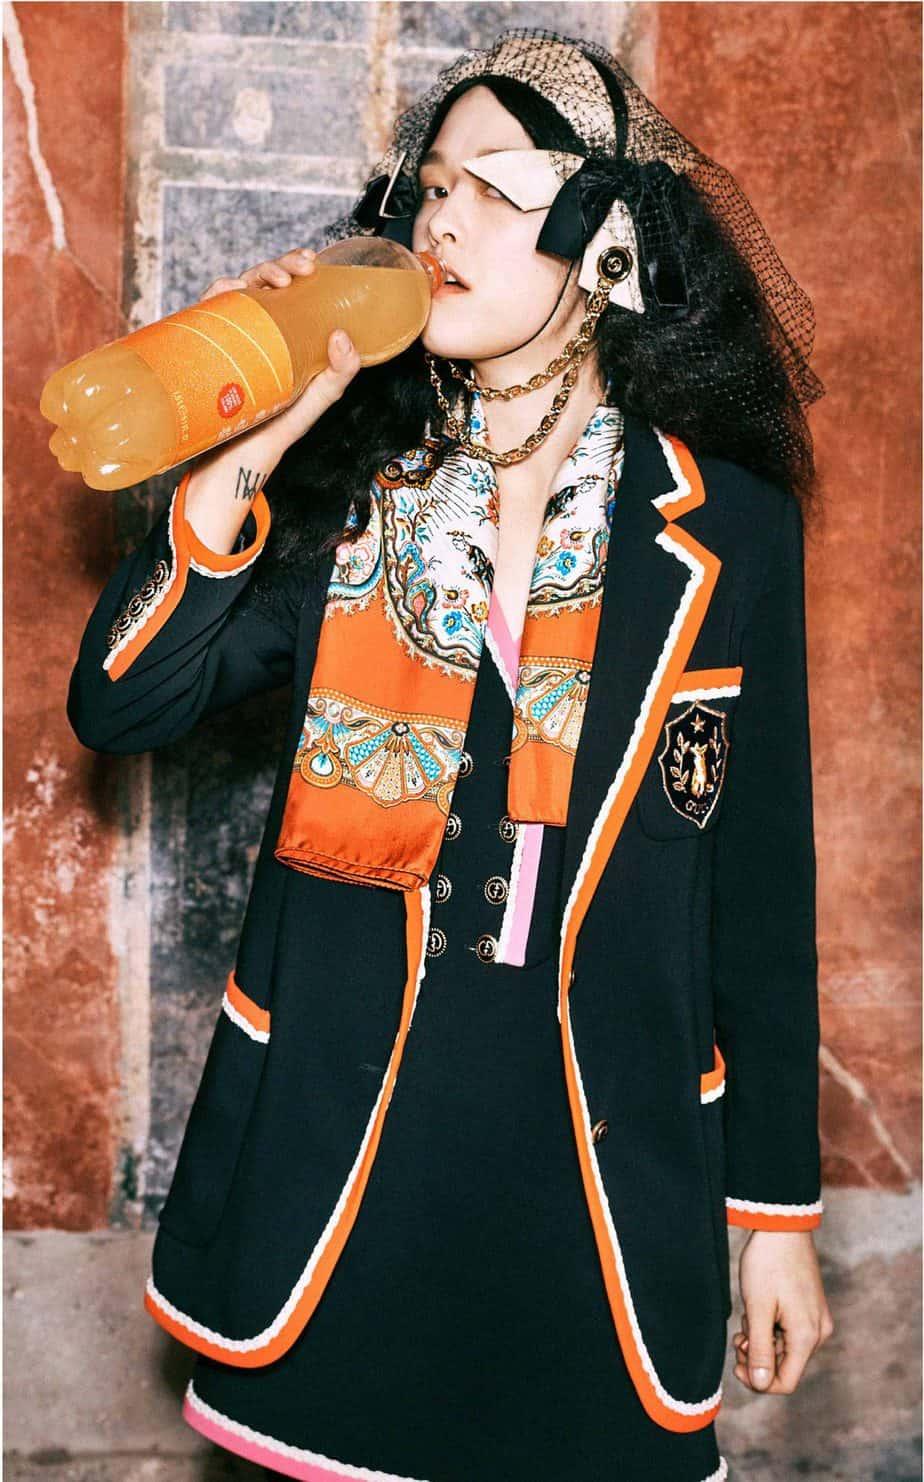 GUCCI, FALL 2019. WOMEN'S FASHION, Photographer Harmony Korine, Art Director, Christopher Simmonds - 96